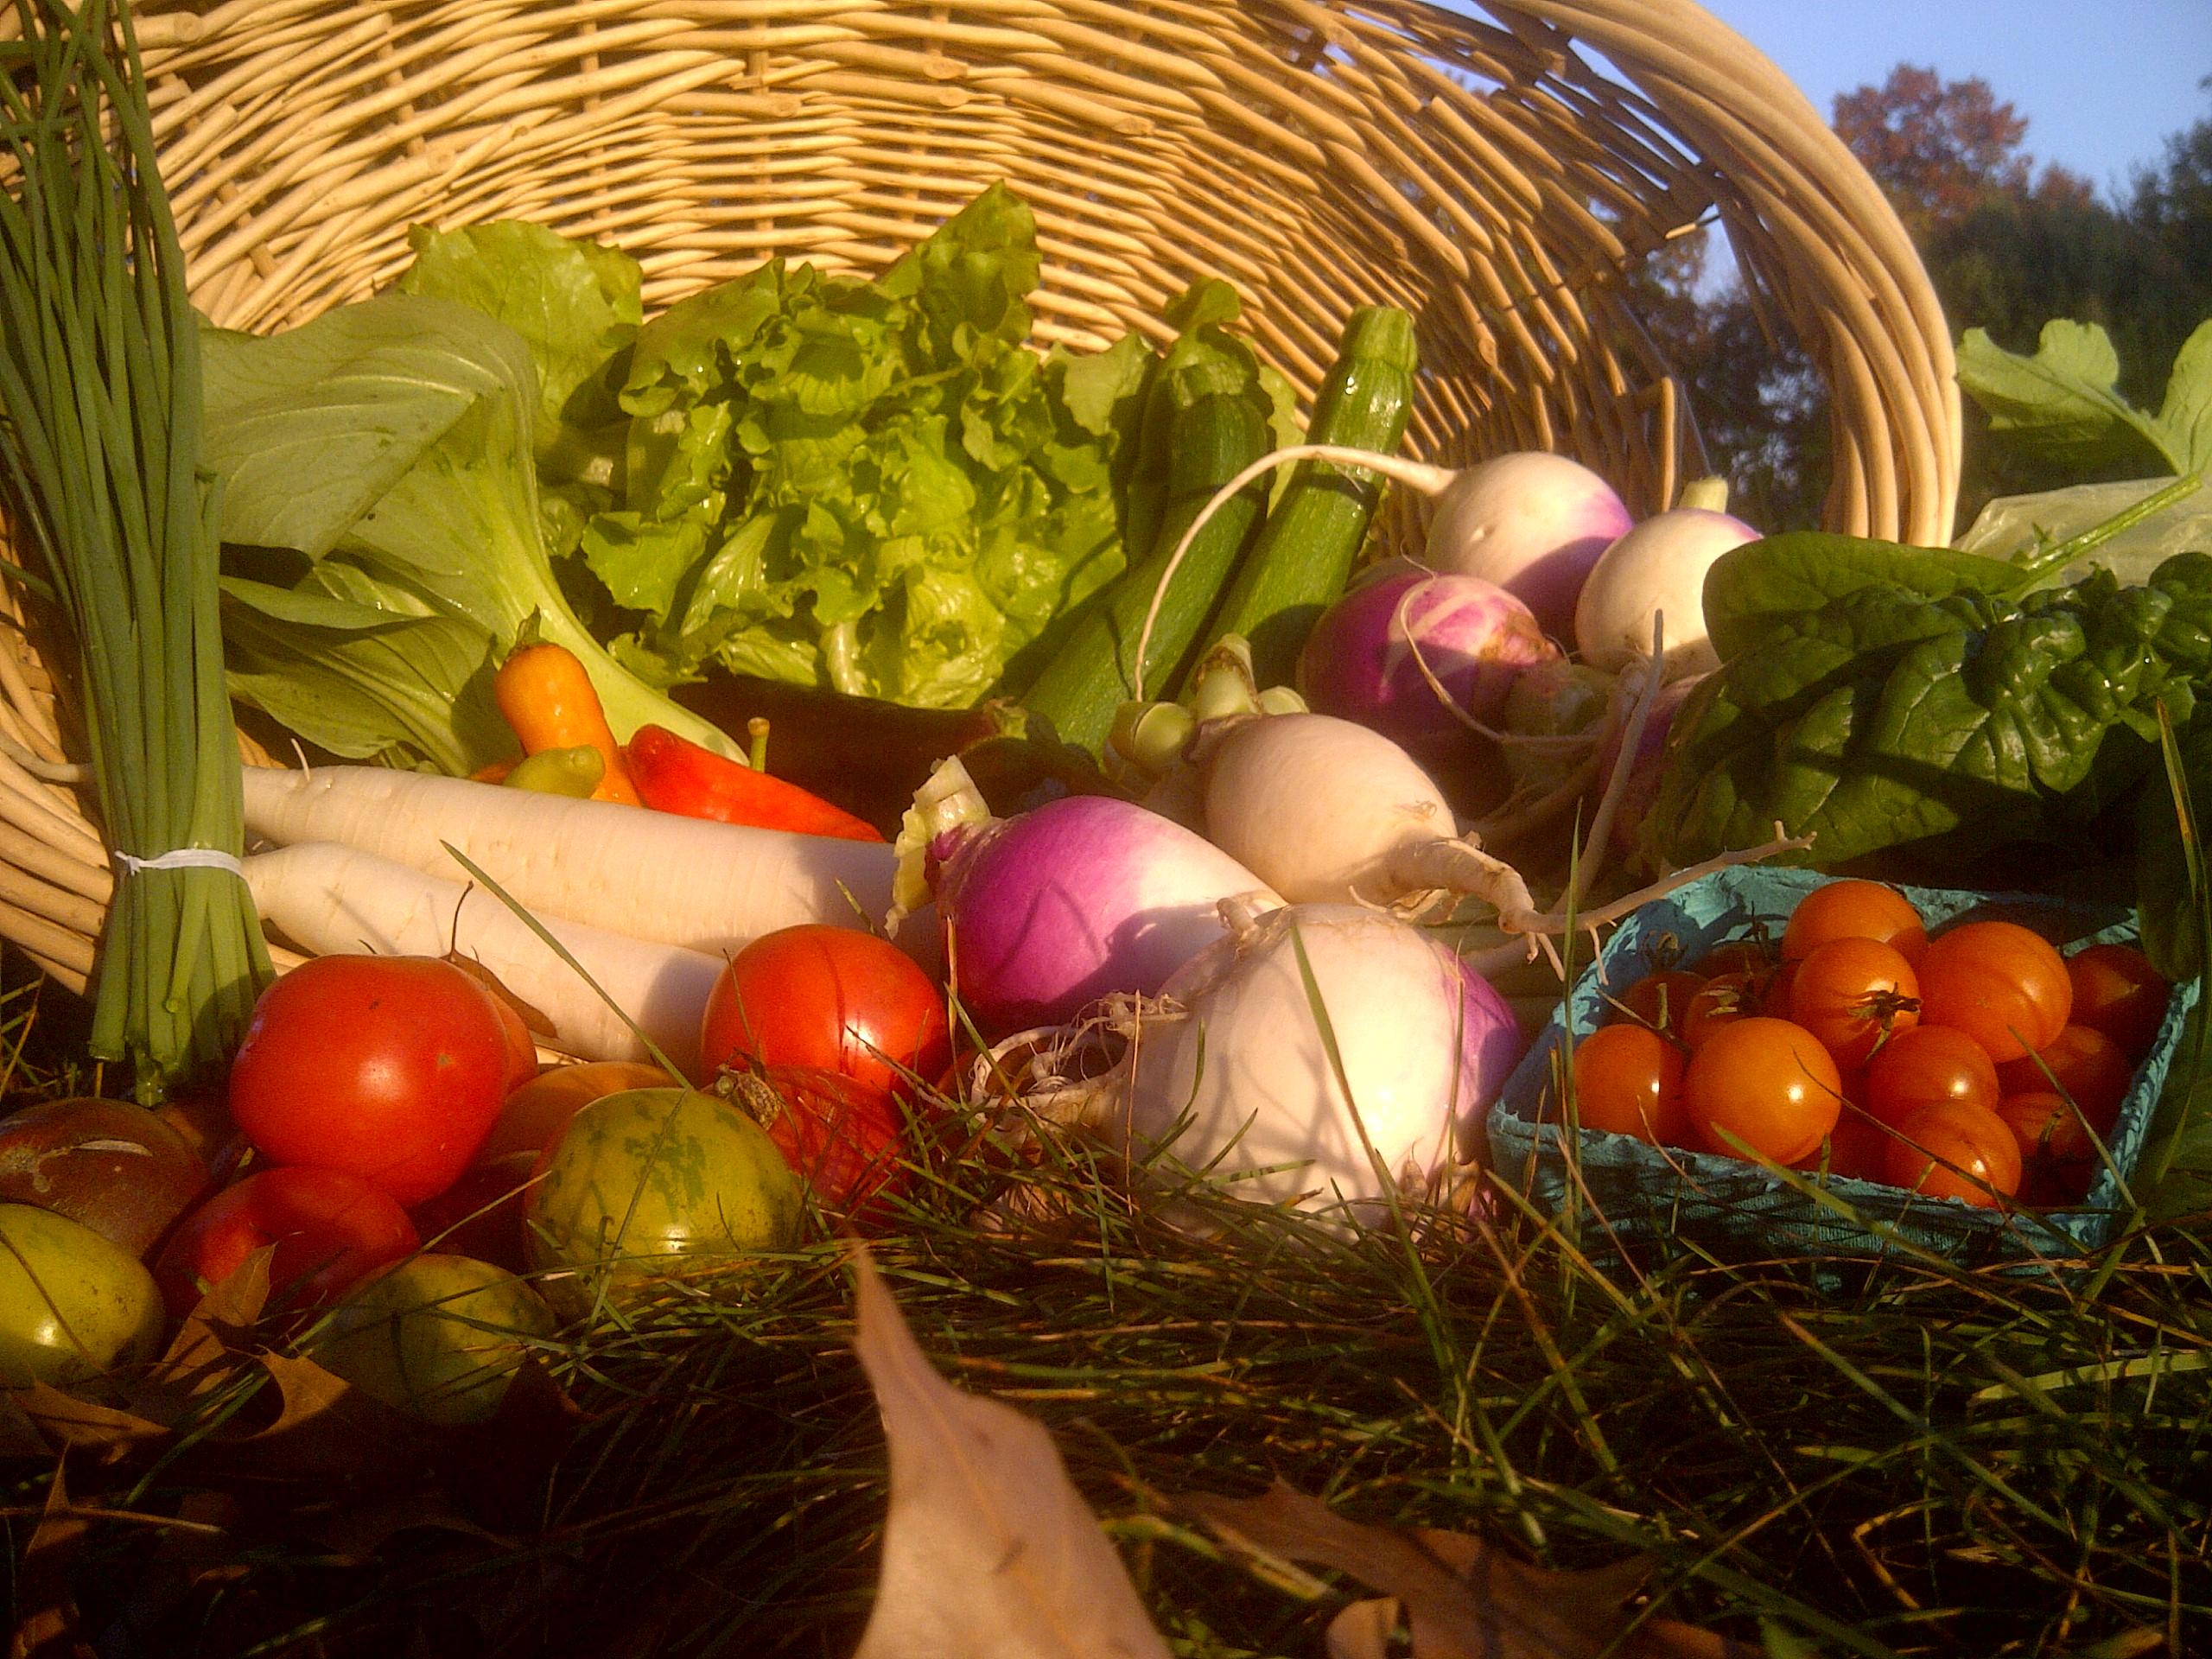 October 2012 – CAASTLC\'s Seeds of Hope Farm